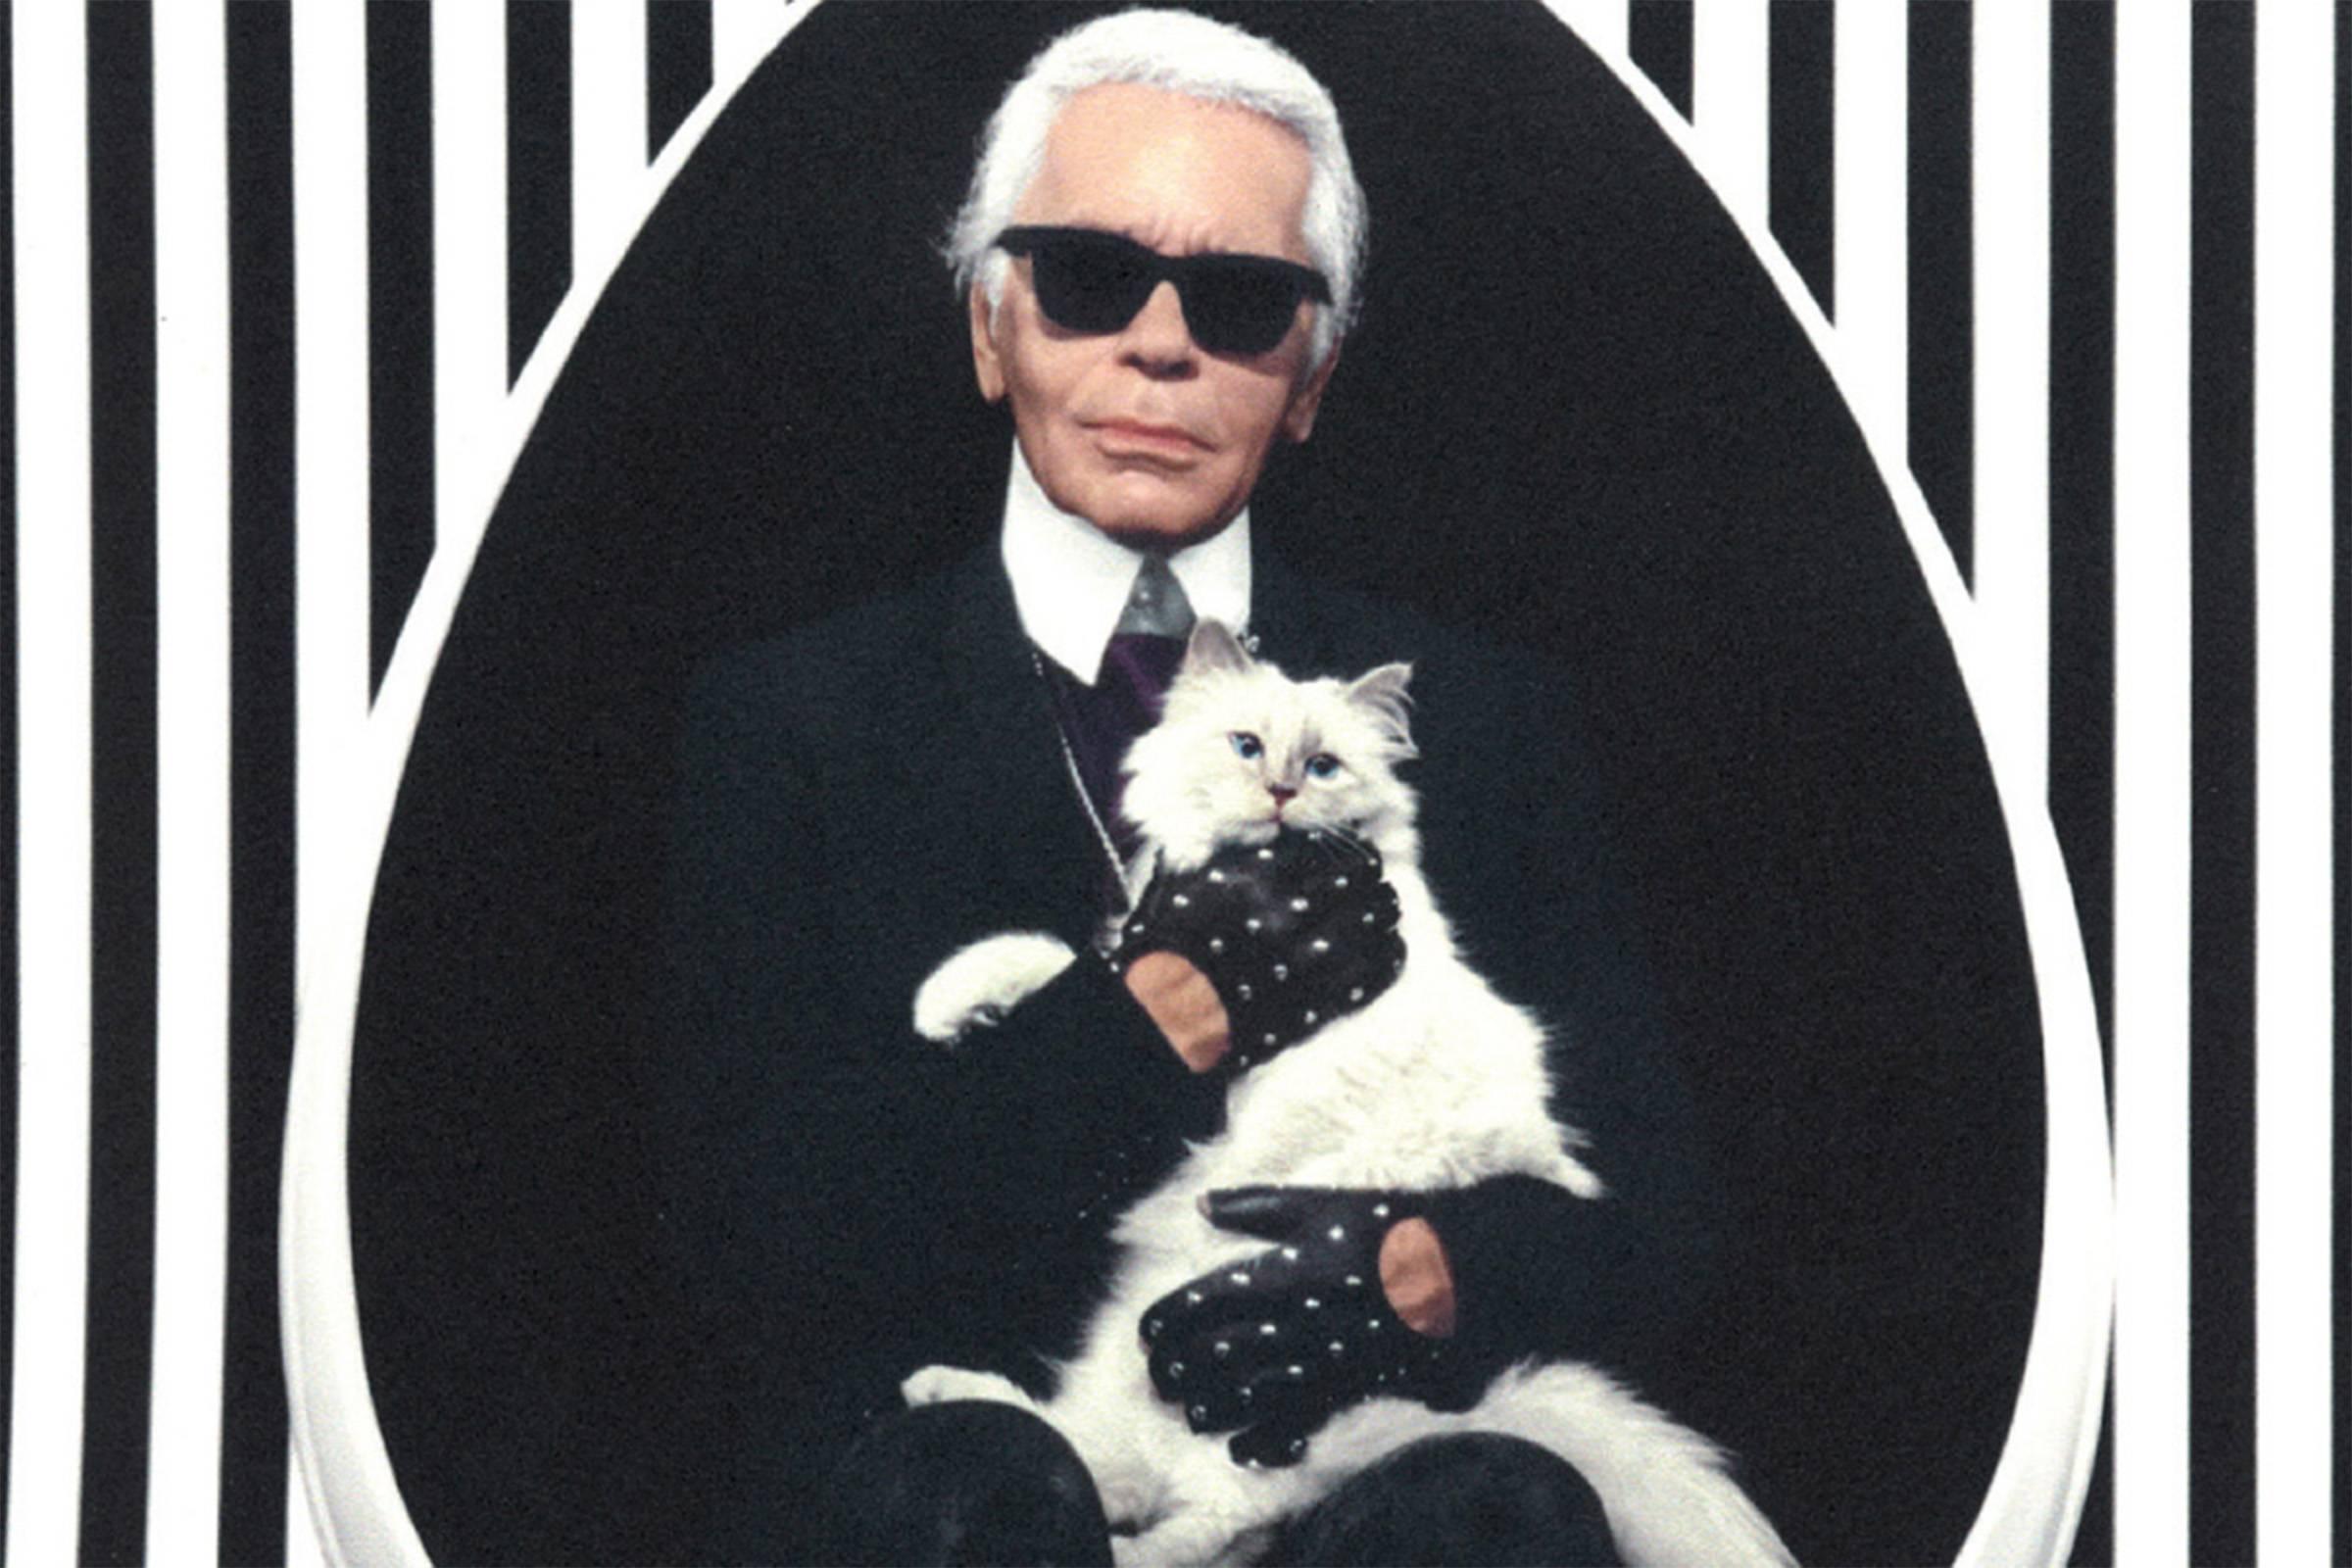 Heroine: The Mercurial, Obsessive Life of Karl Lagerfeld